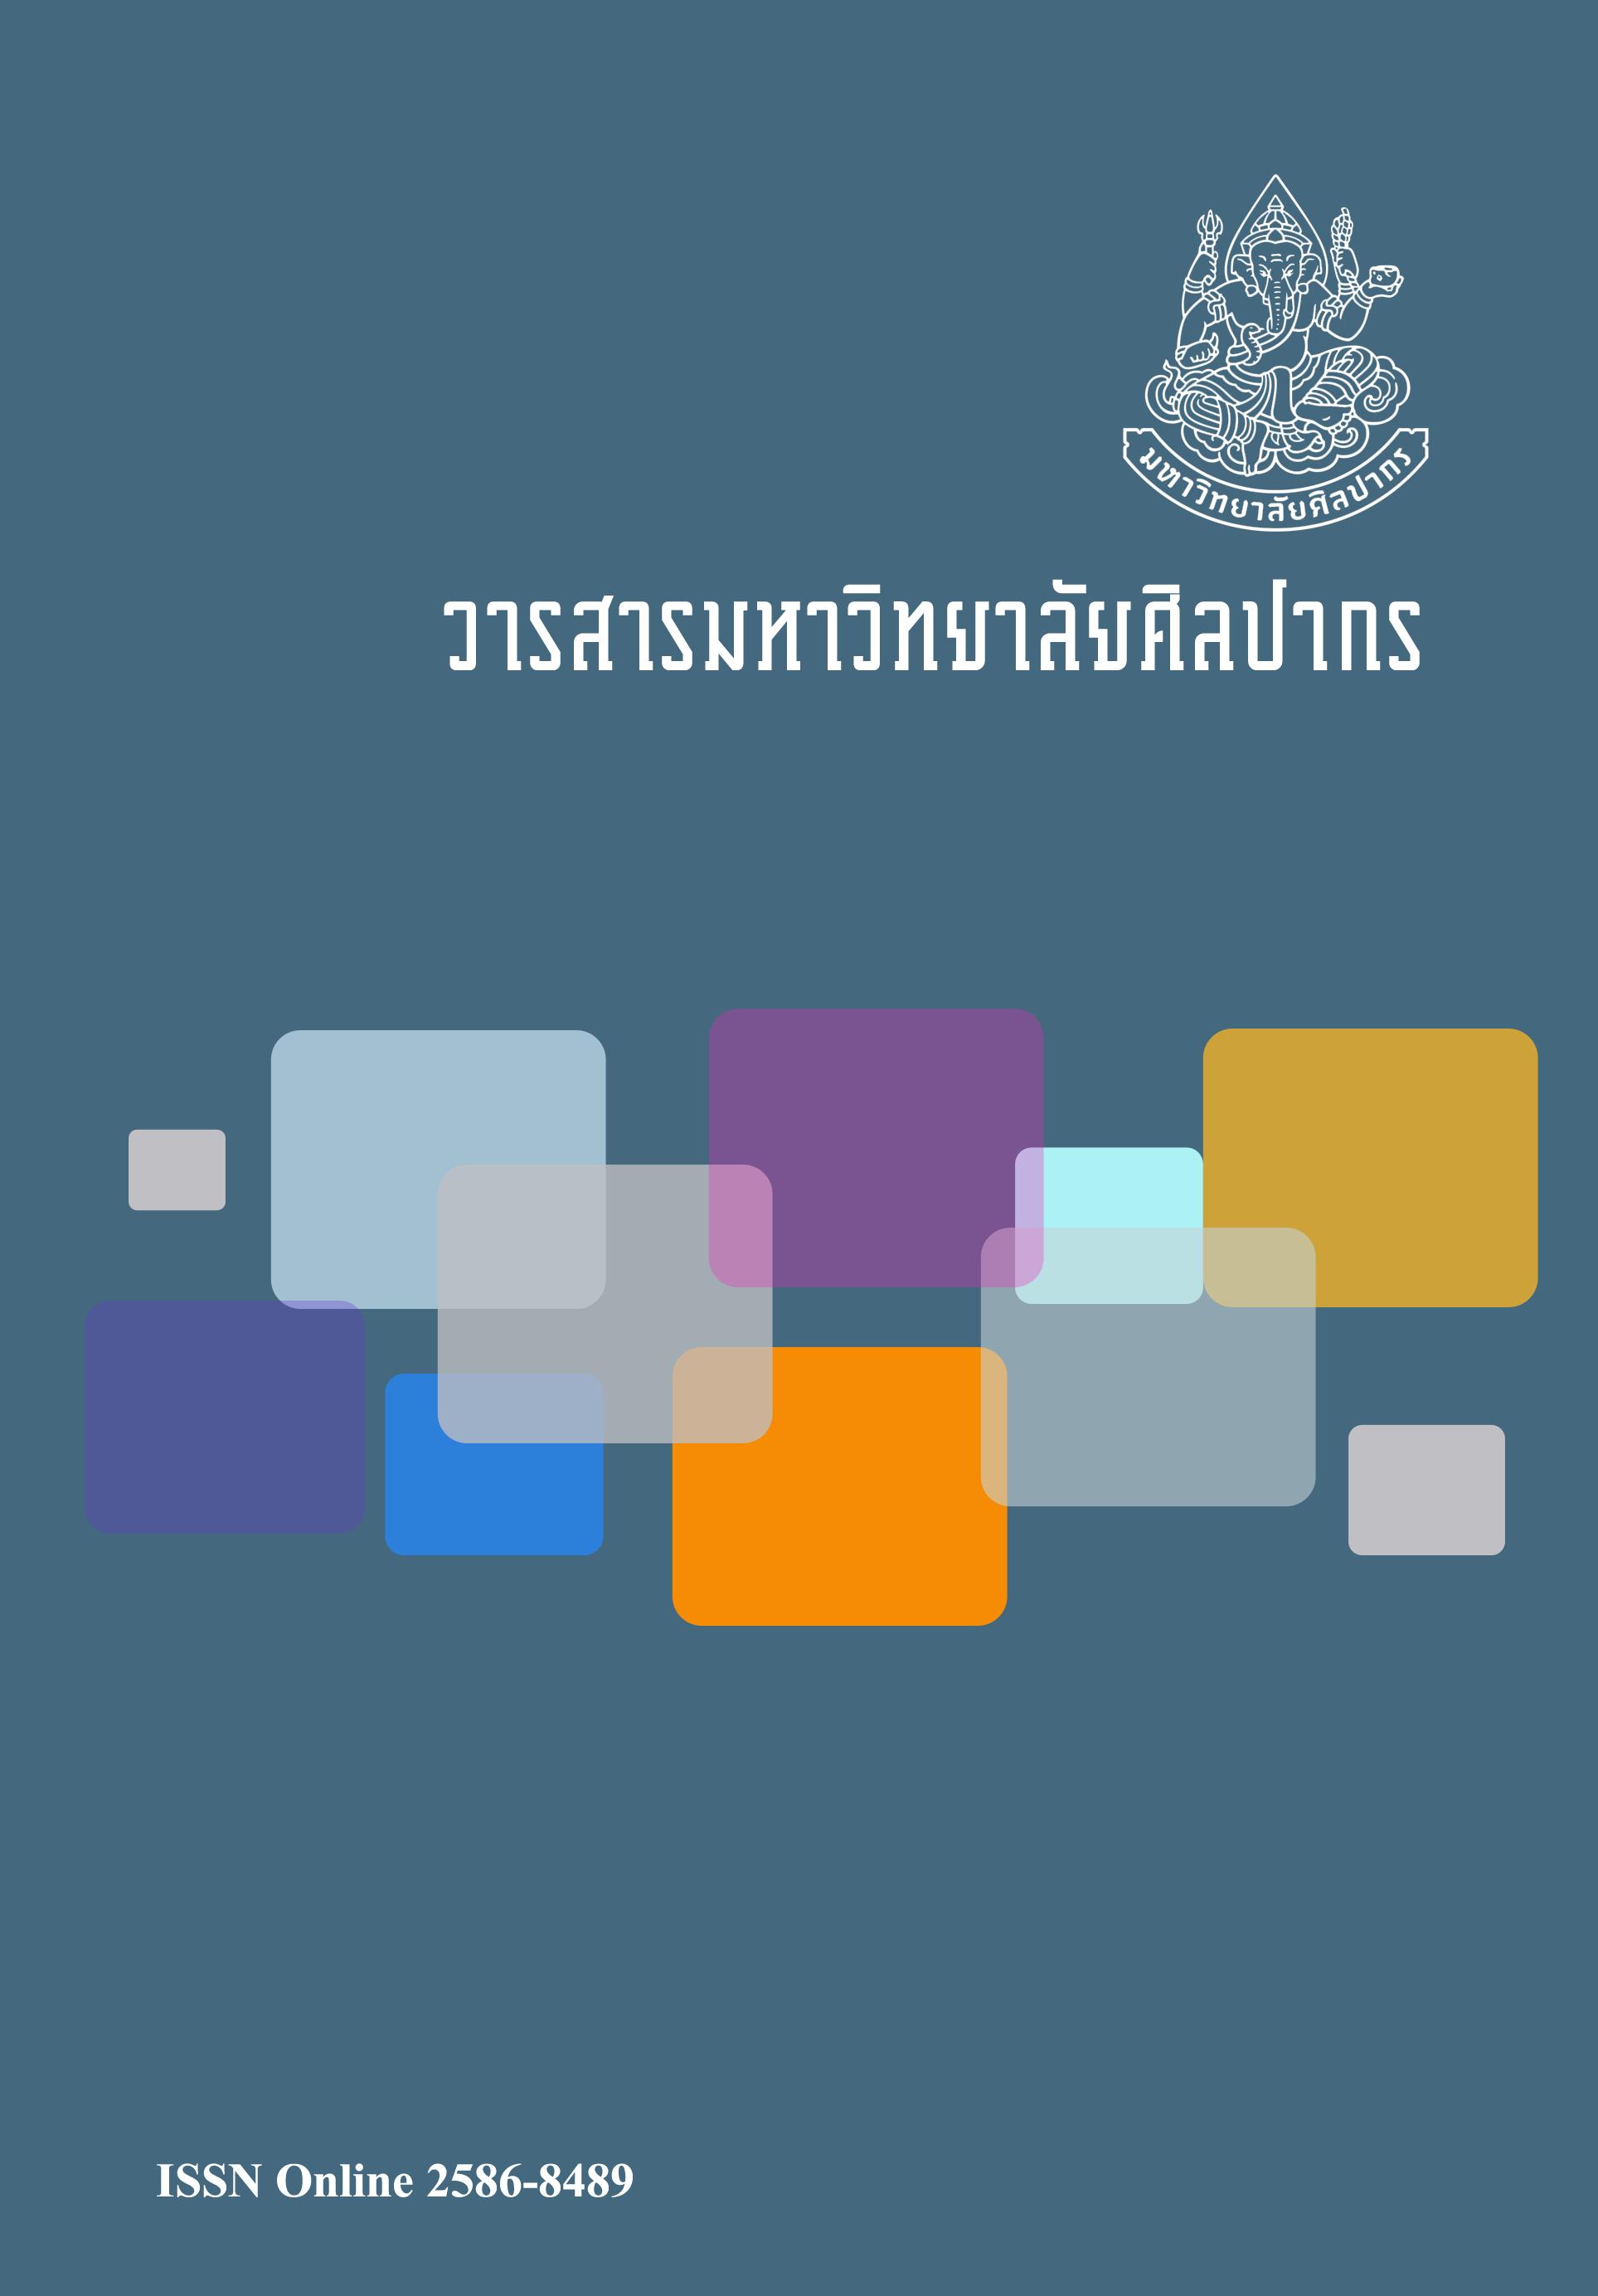 Coverฉบับภาษาไทย3